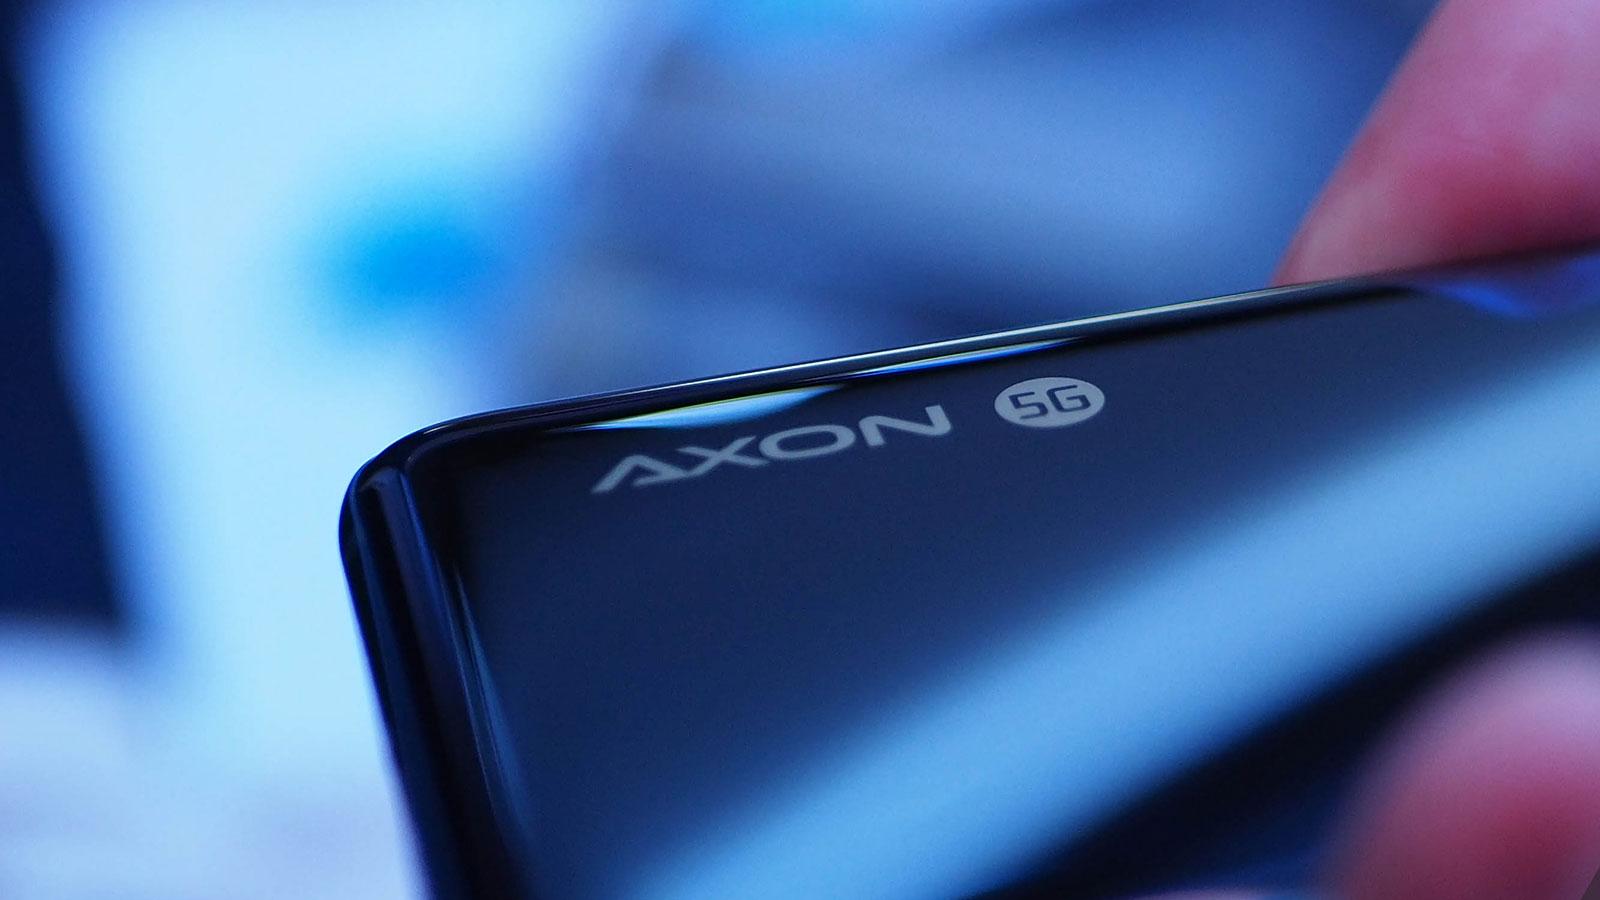 گوشی Axon 10 Pro 5G